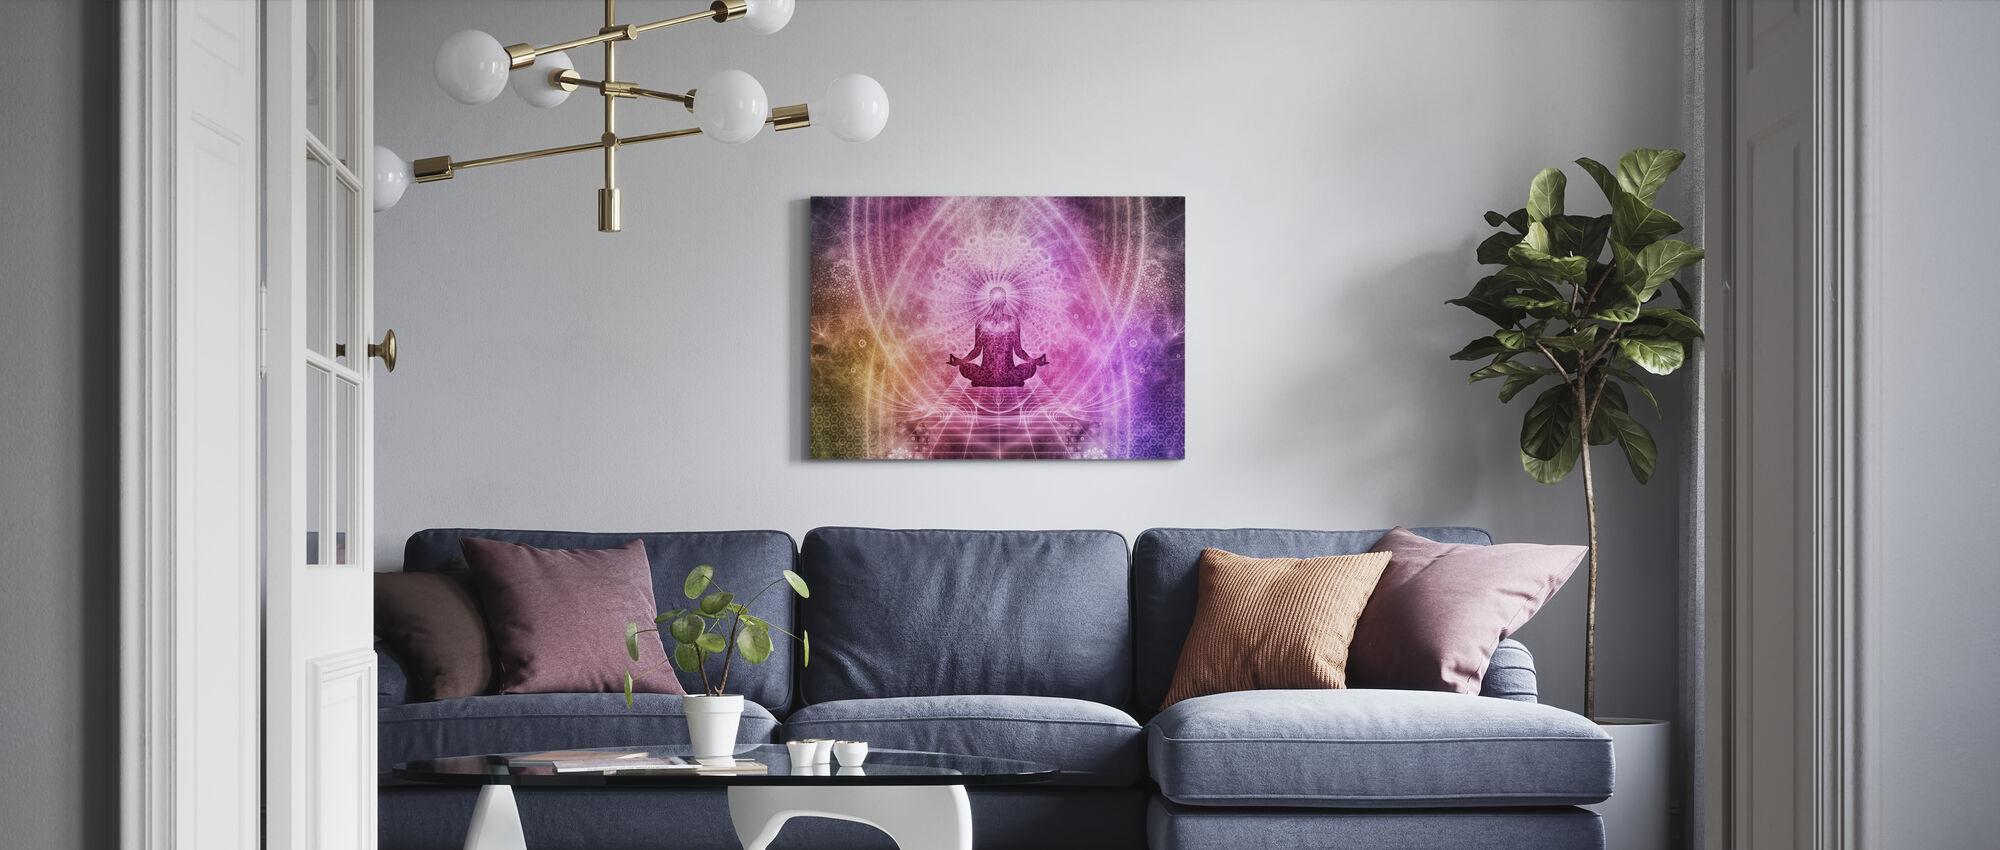 Spiritual Meditation - Canvas print - Living Room